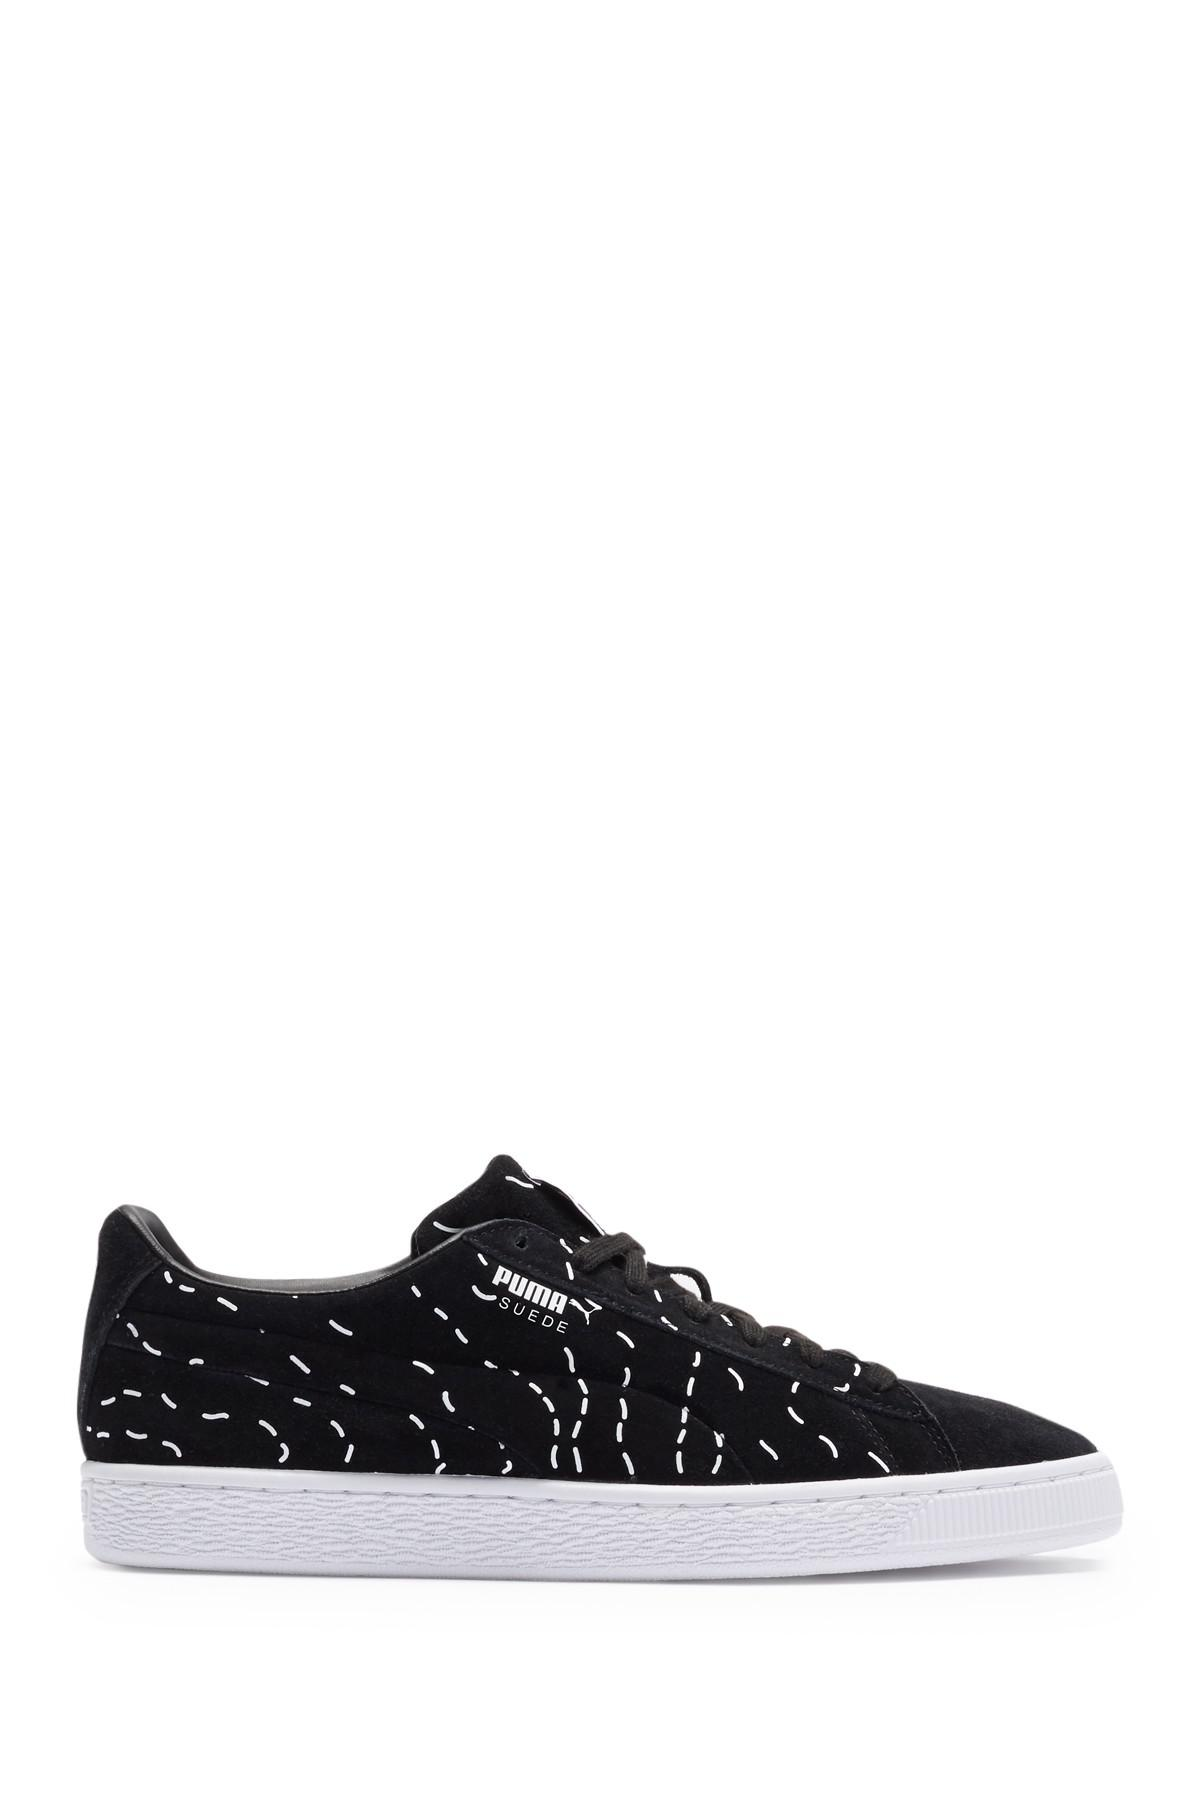 PUMA Suede Sm Sneaker in Black for Men